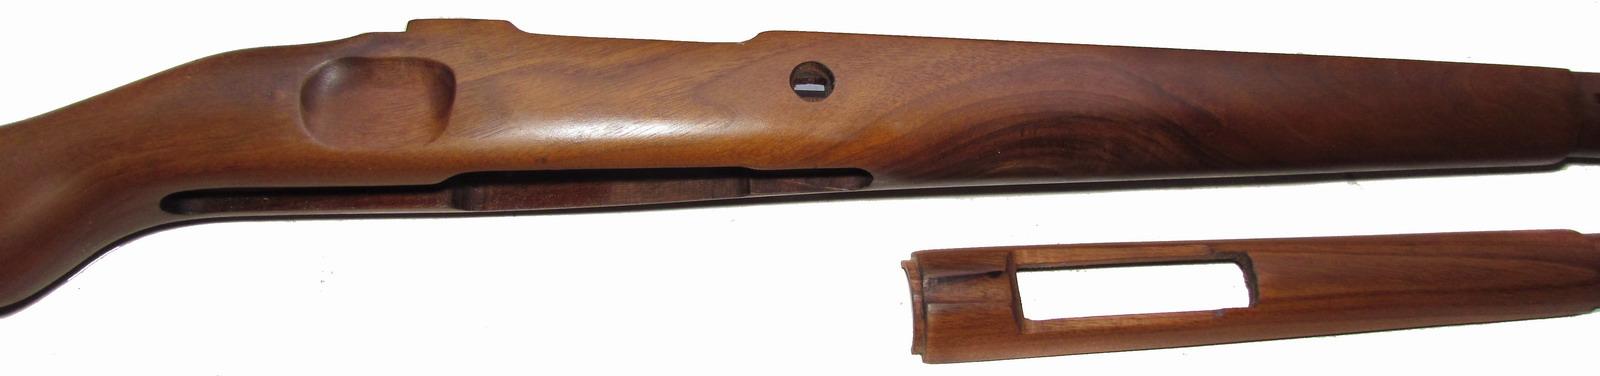 PPHU Fox - Wooden gun stocks